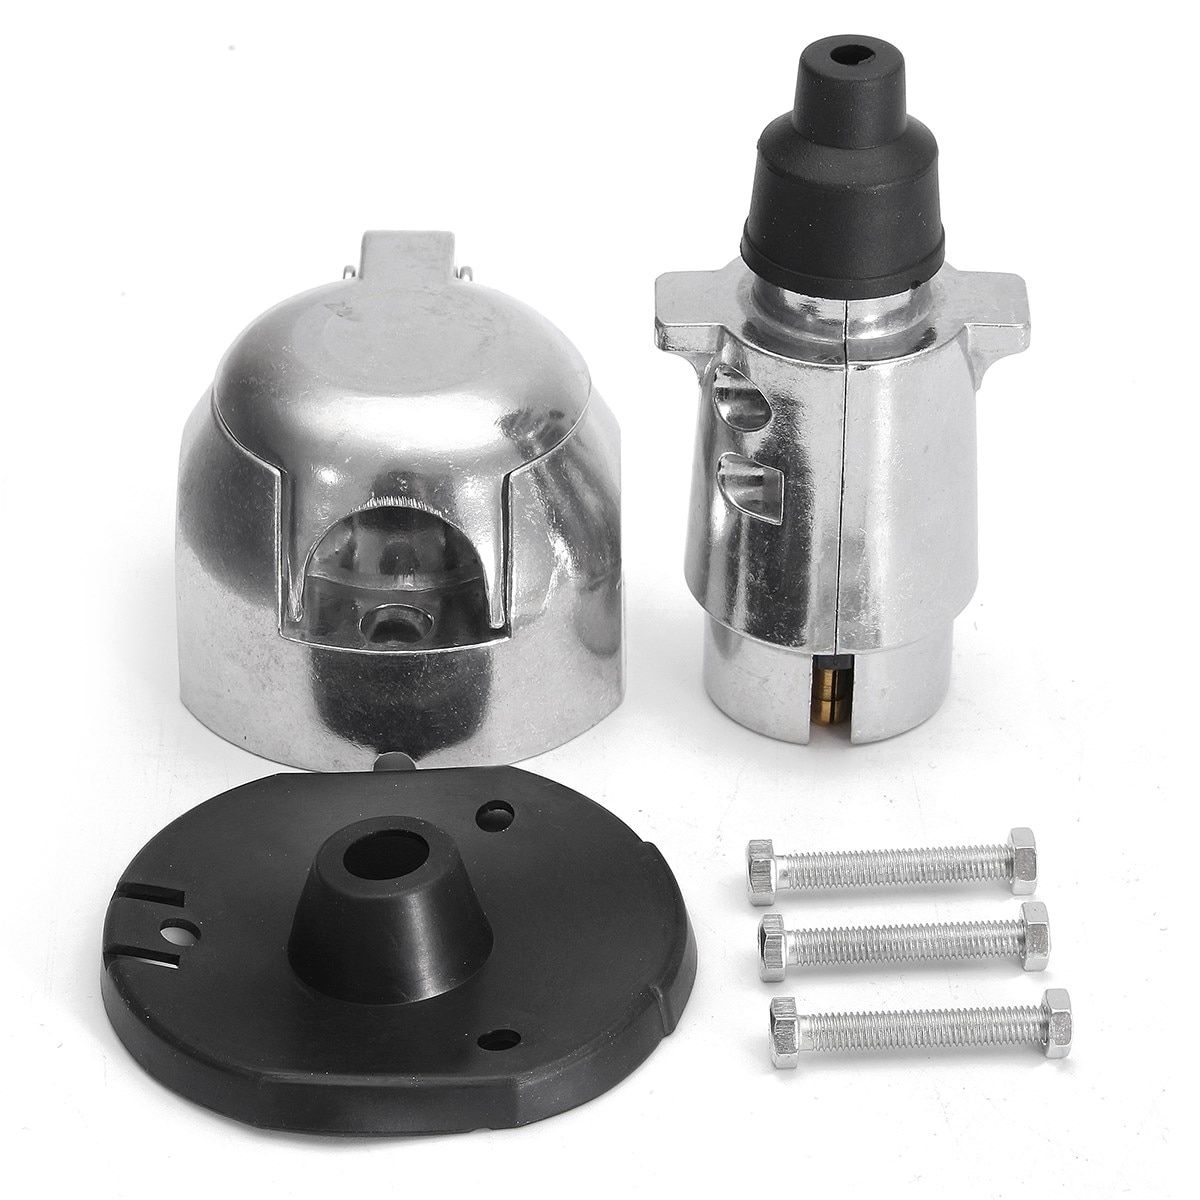 12N 7 pin Metal Towing Plug & Socket Connector Kit for Towbar Caravan Traile